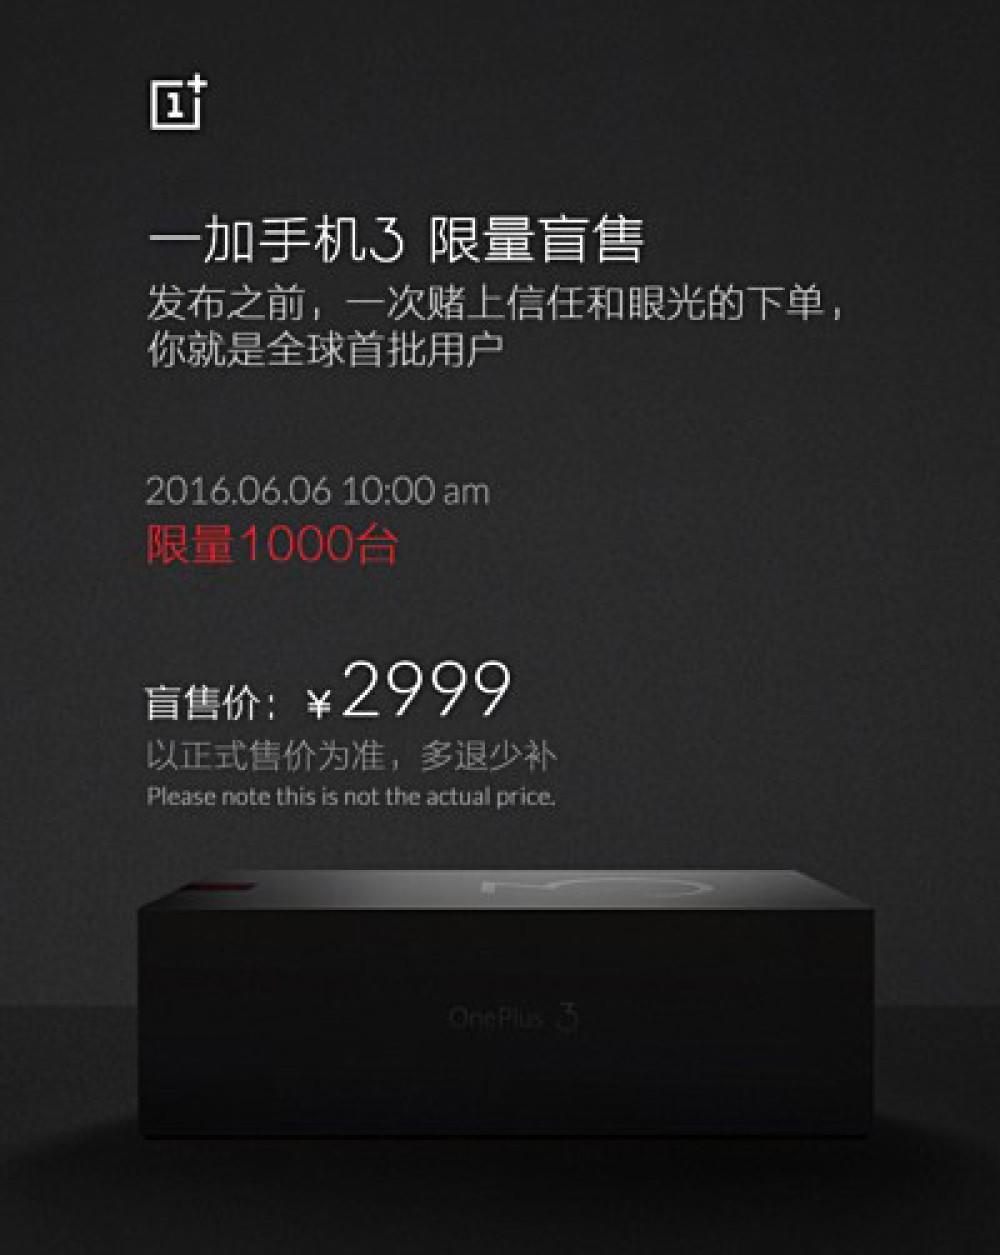 OnePlus 3: Πρώτο video teaser και 1000 τεμάχια προς πώληση μία εβδομάδα πριν την παρουσίαση